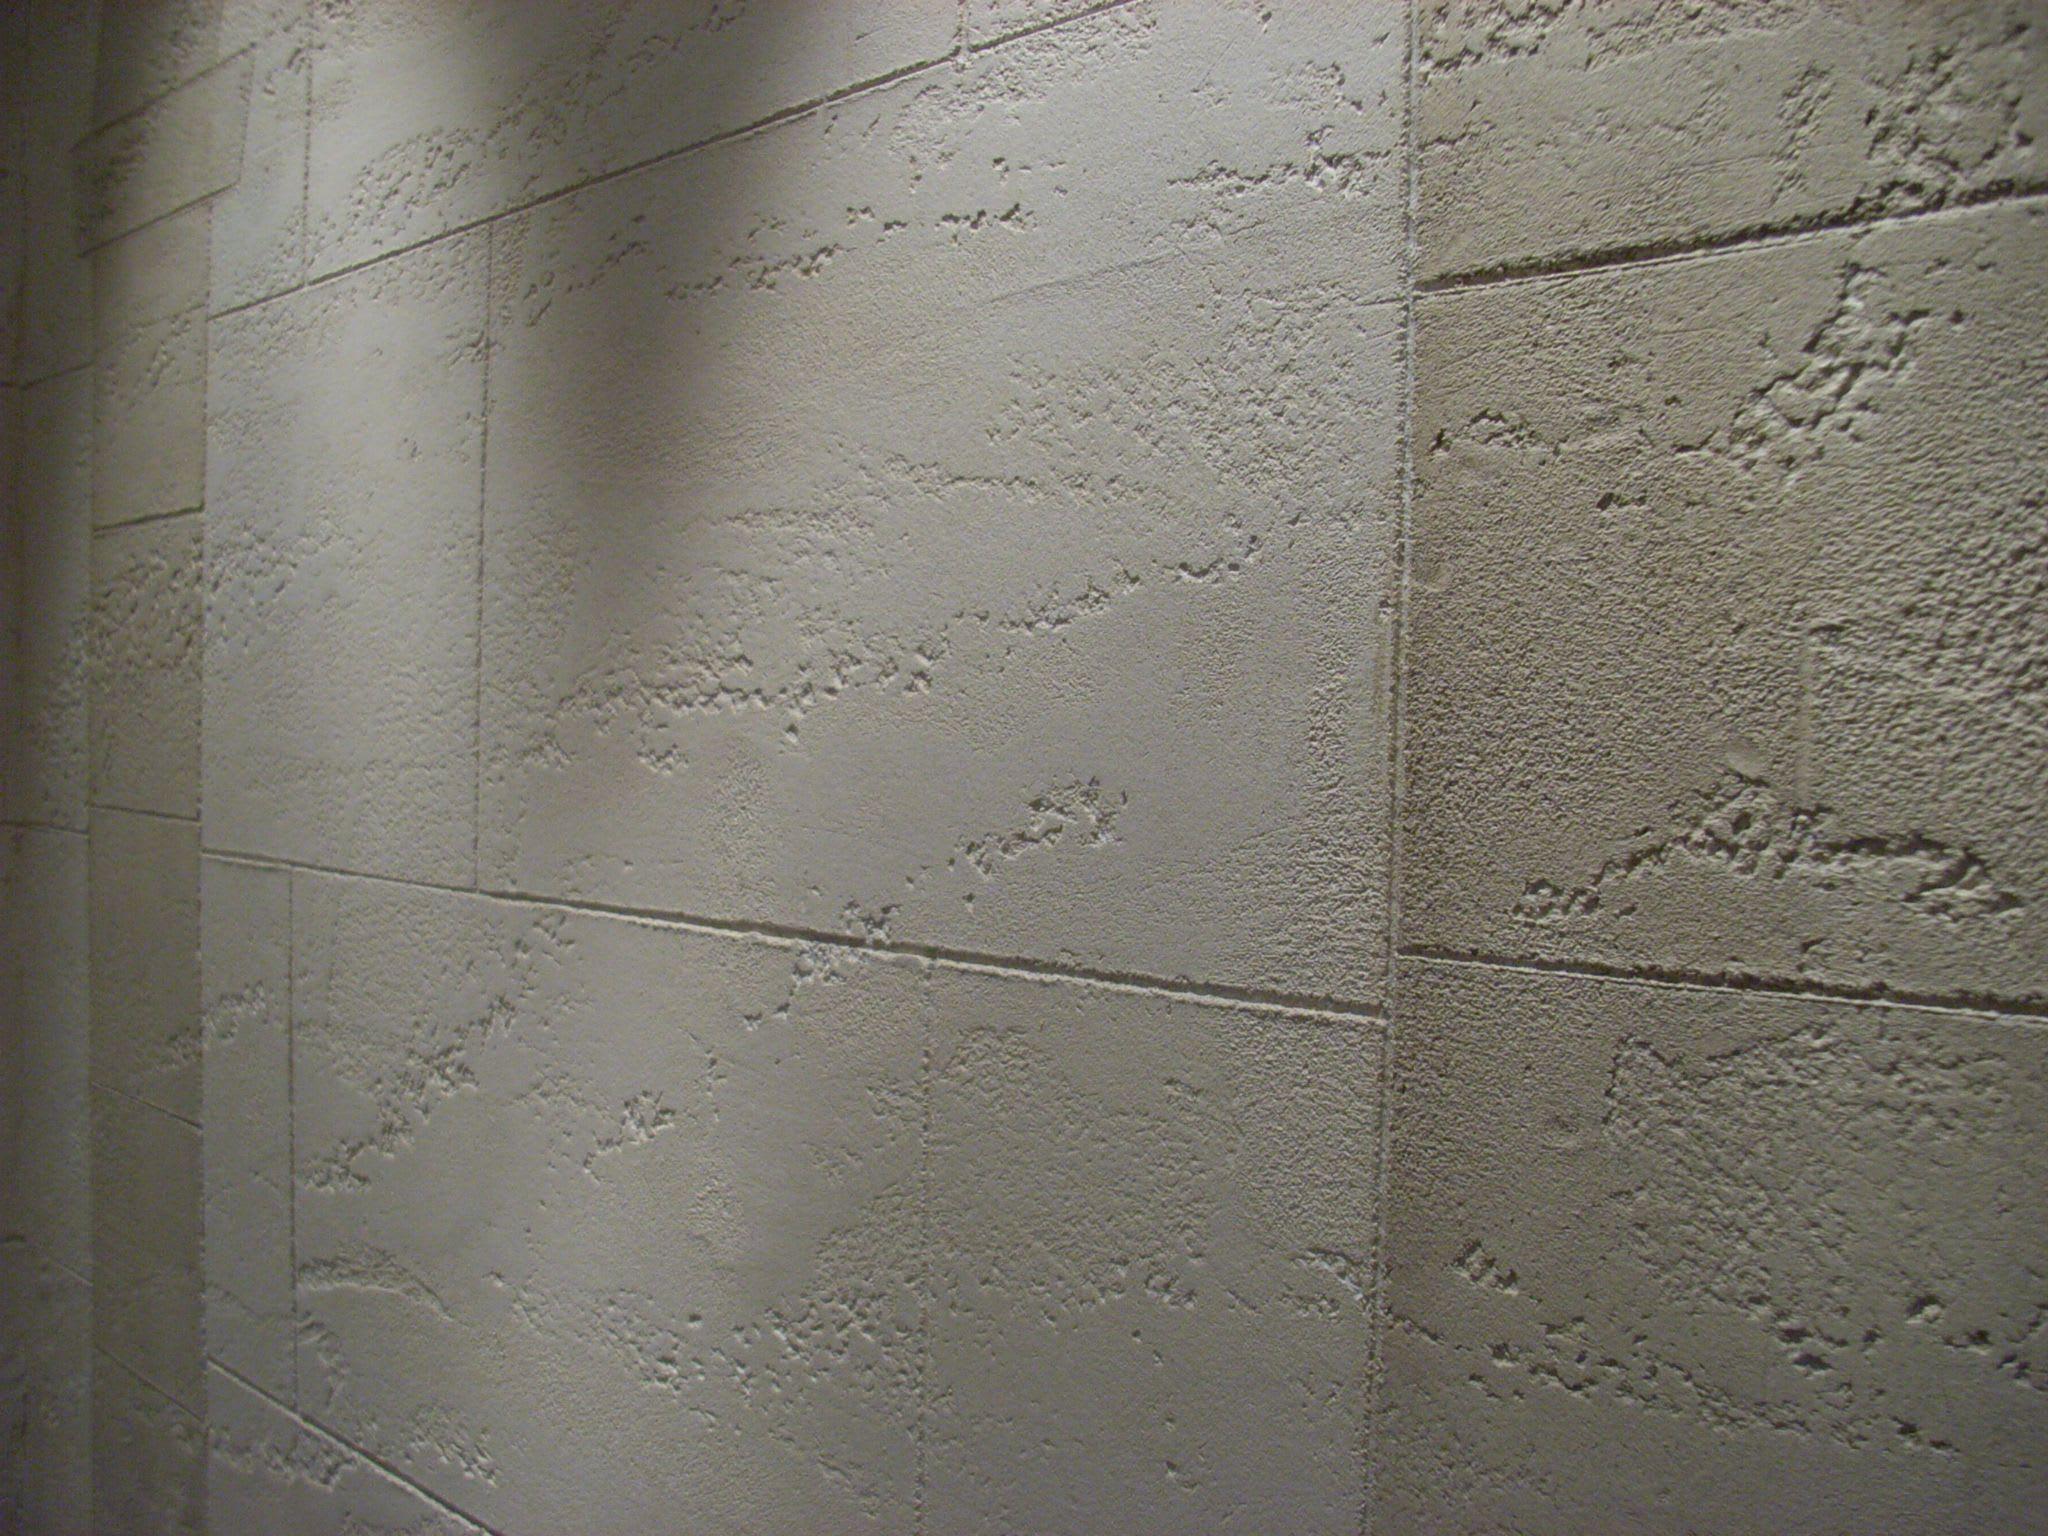 Steinimitation weiße Steinwand rau Fließen